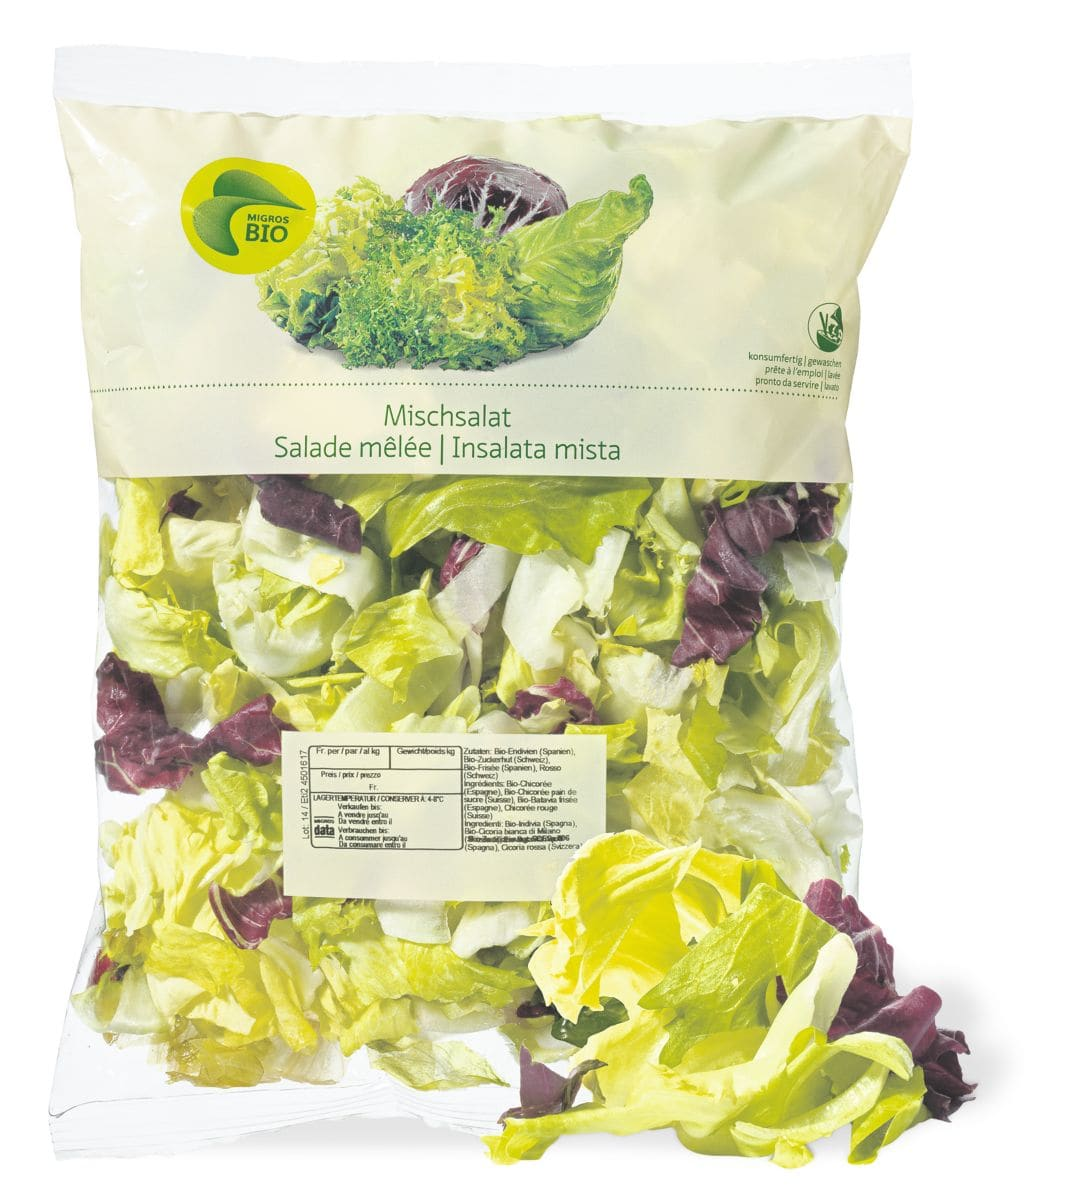 Bio Salade mêlée